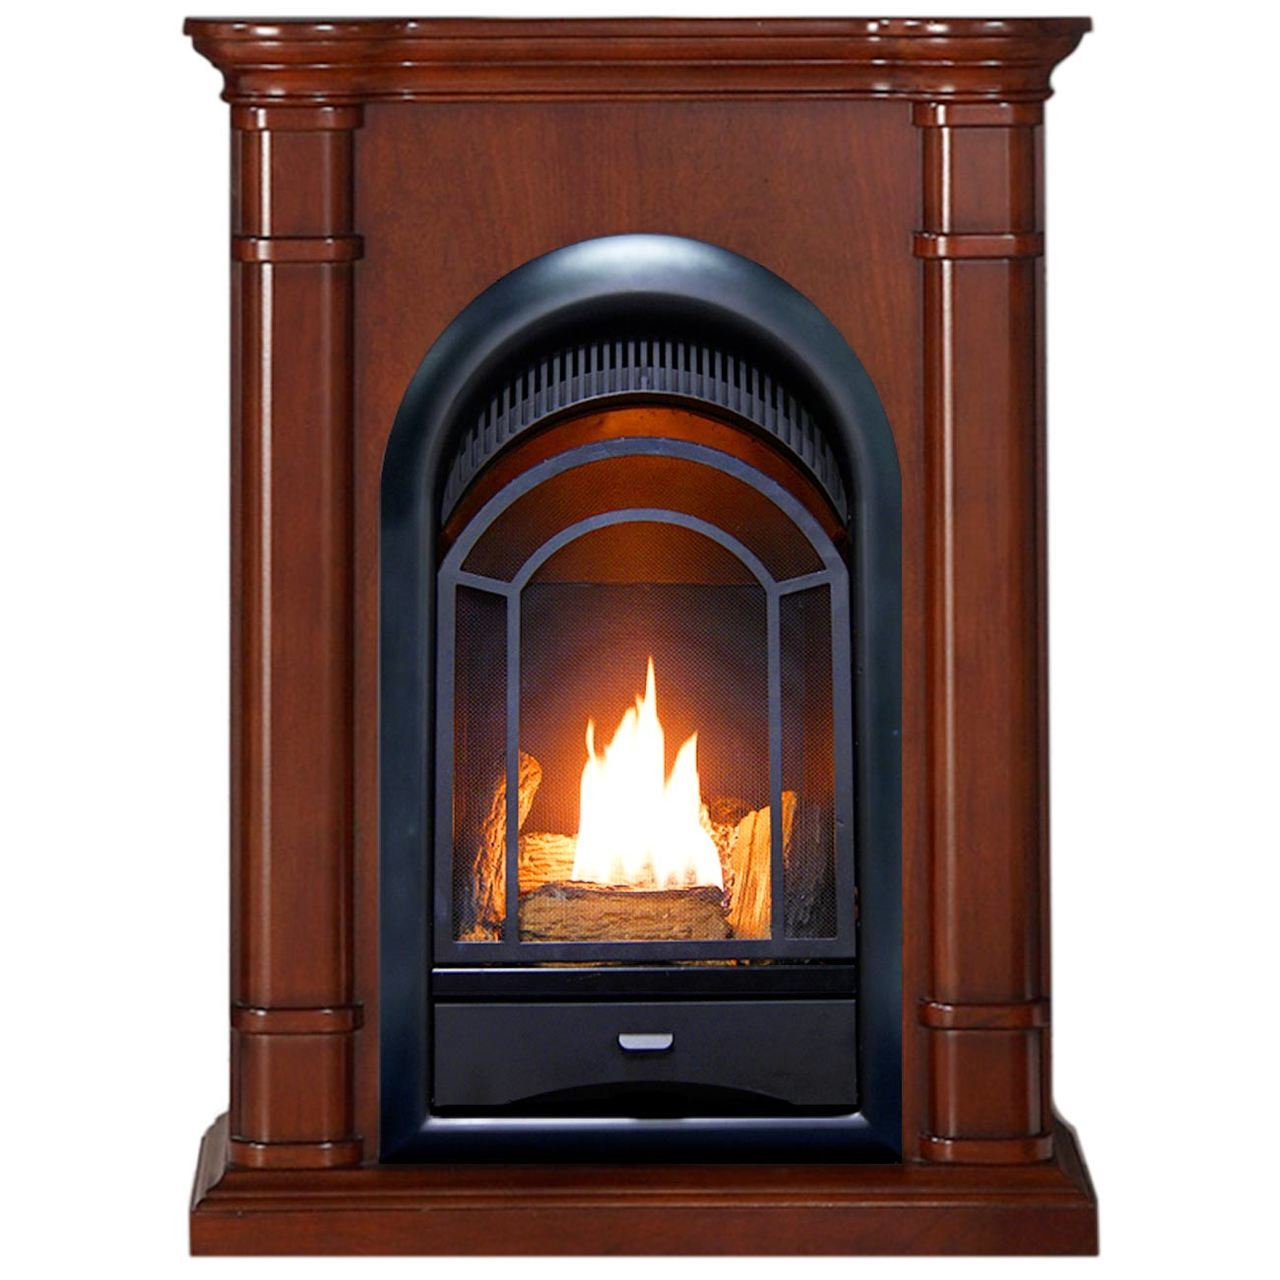 ProCom FS100T-3W Ventless Fireplace System 10K BTU Duel Fuel Thermostat Insert and Walnut Mantel by